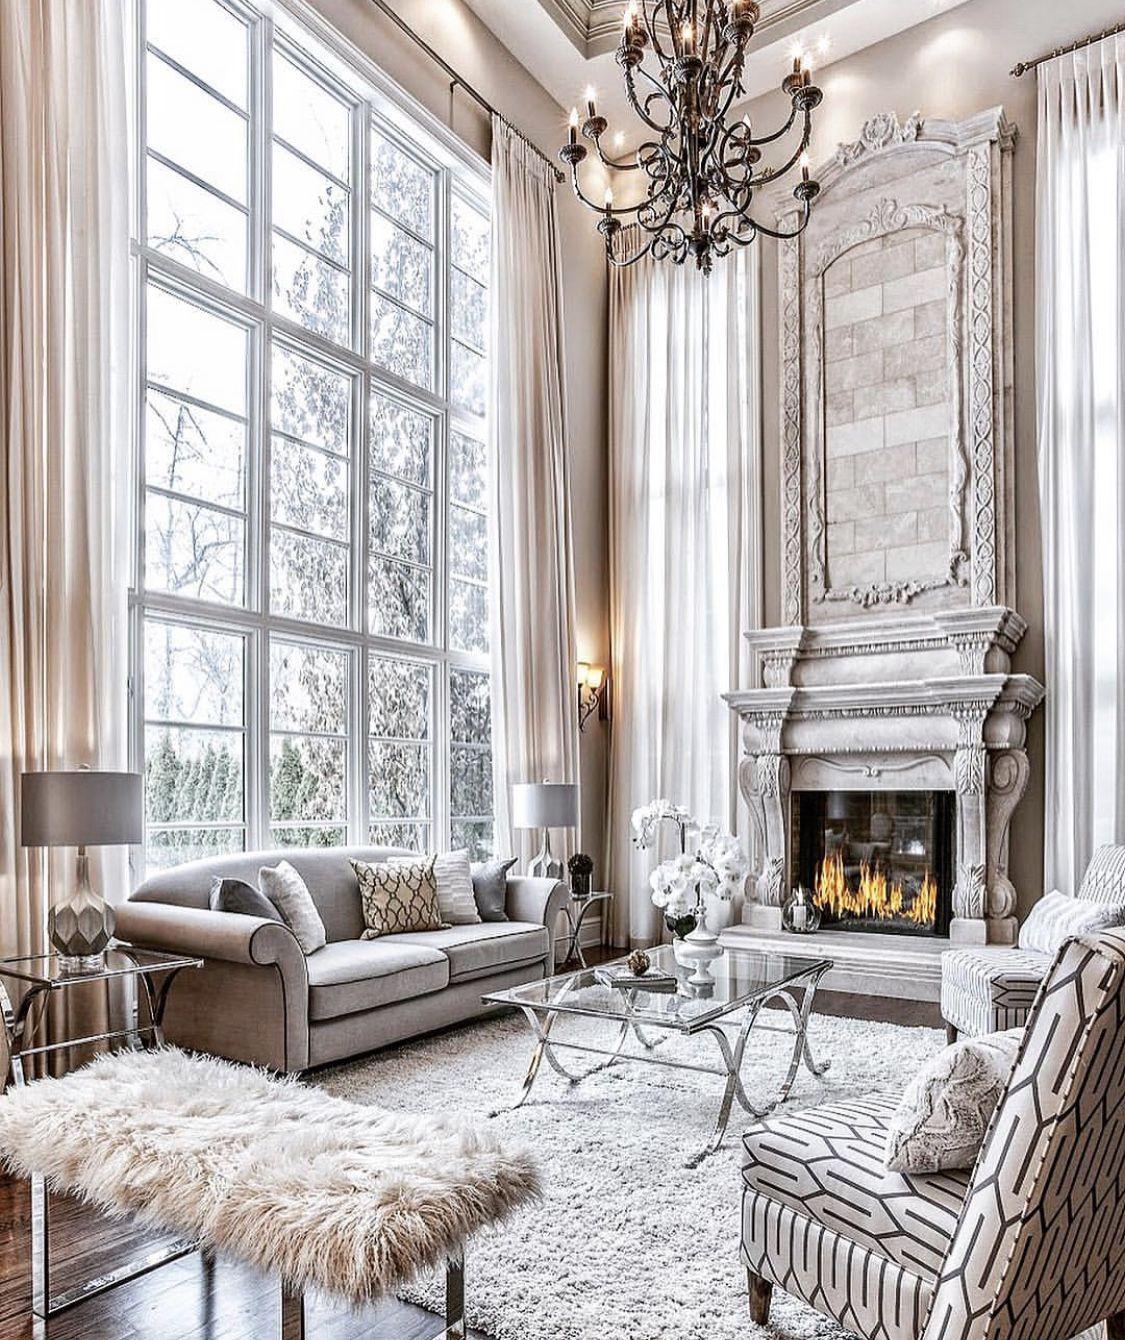 Stunning art deco style grey living room decor | Luxury ...